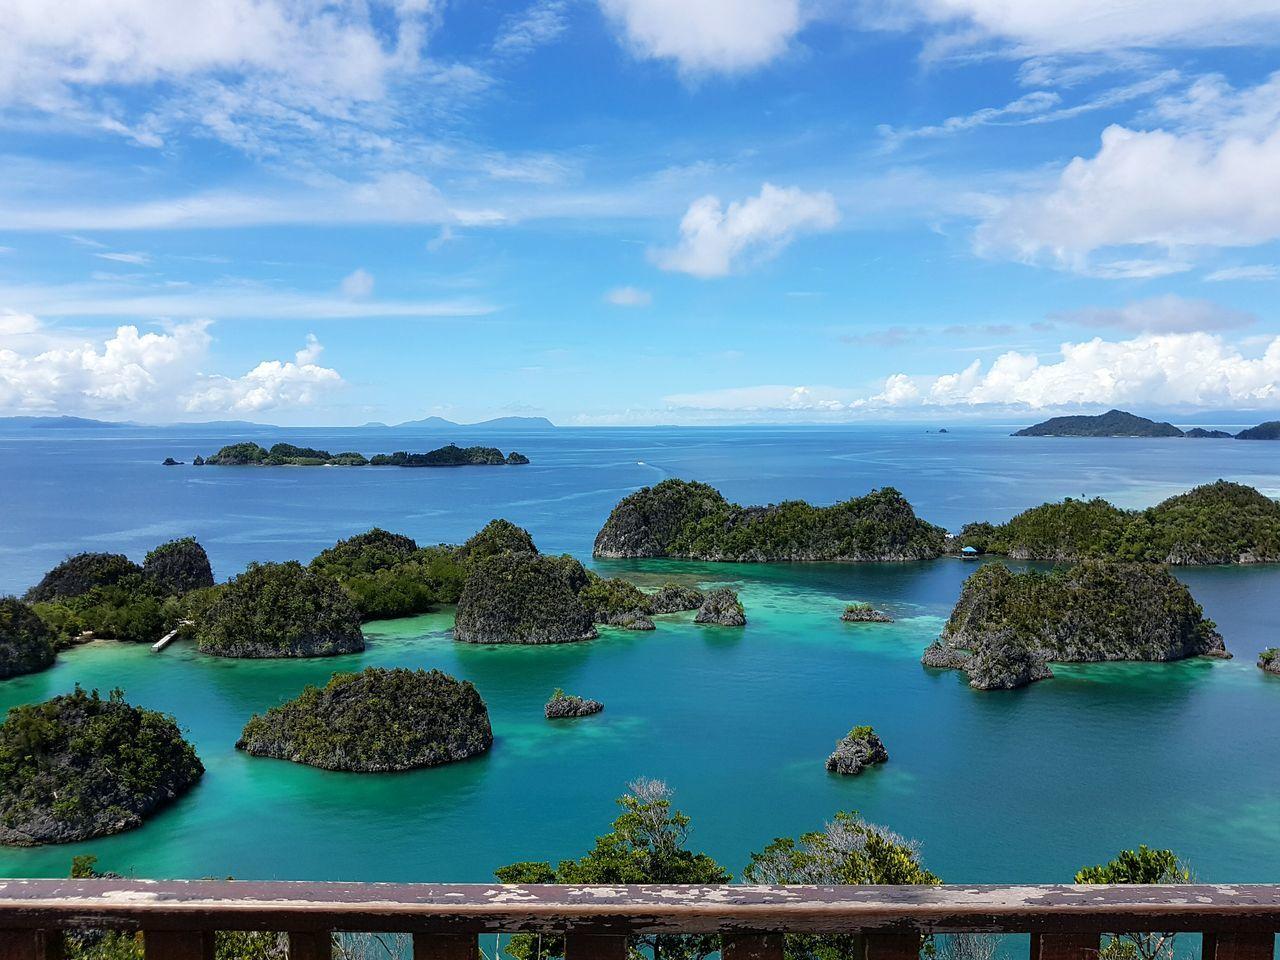 EyeEm Selects Sea Water Horizon Over Water Tree Island Sky Nature Pianemo_Island Rajaampat Papua Indonesia